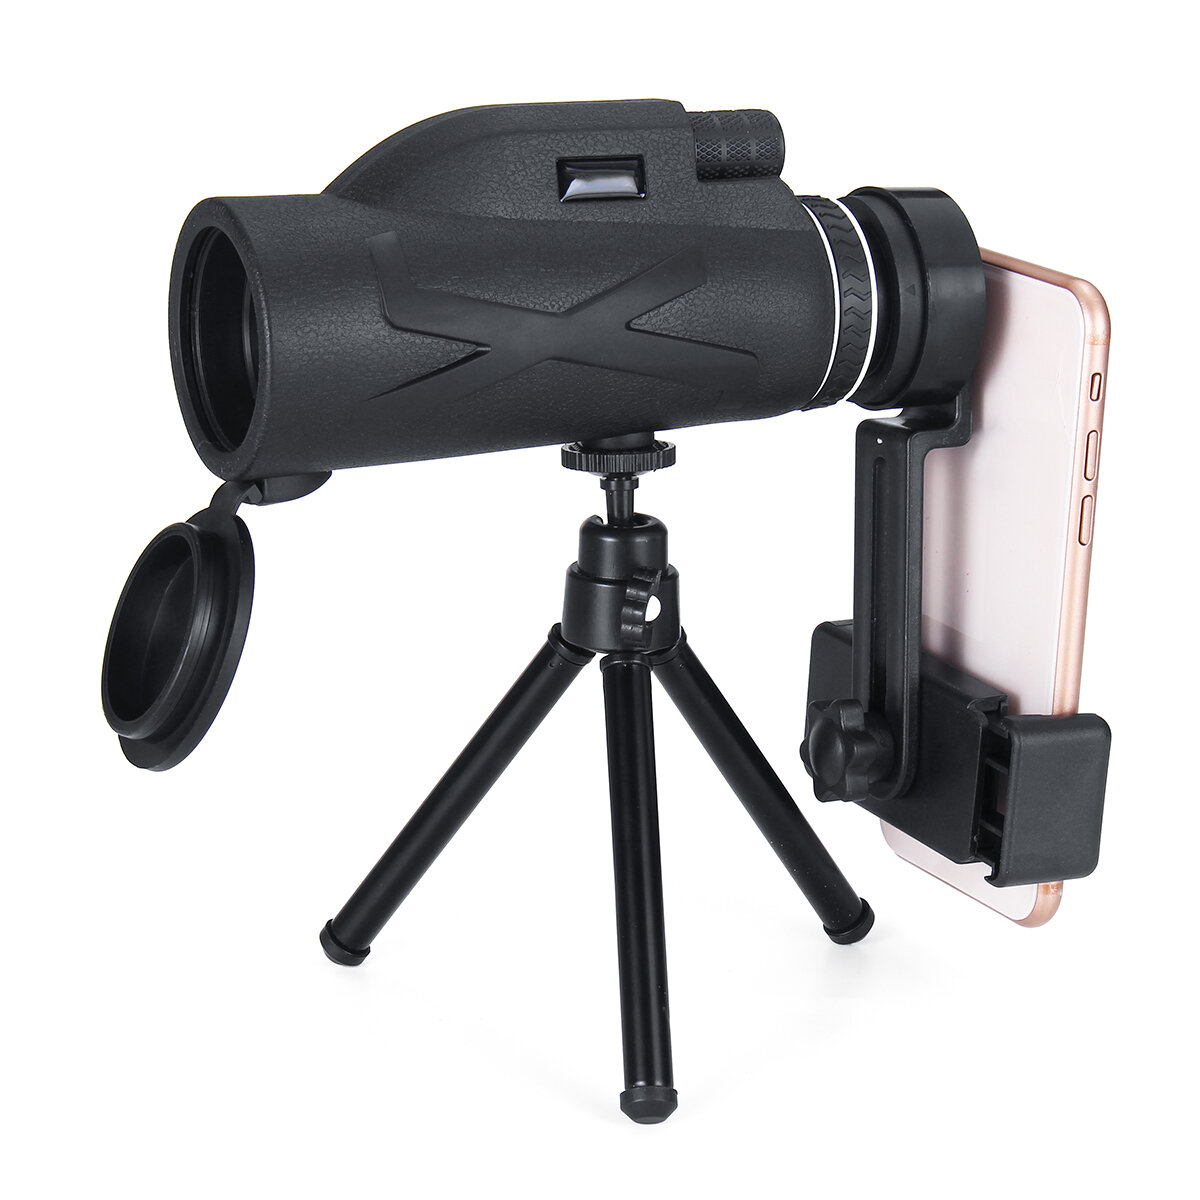 80x100 Ampliação Portátil Monocular Telescópio Poderoso Binóculos Zoom Grande Telescópio Portátil Militar HD Caça Profissional